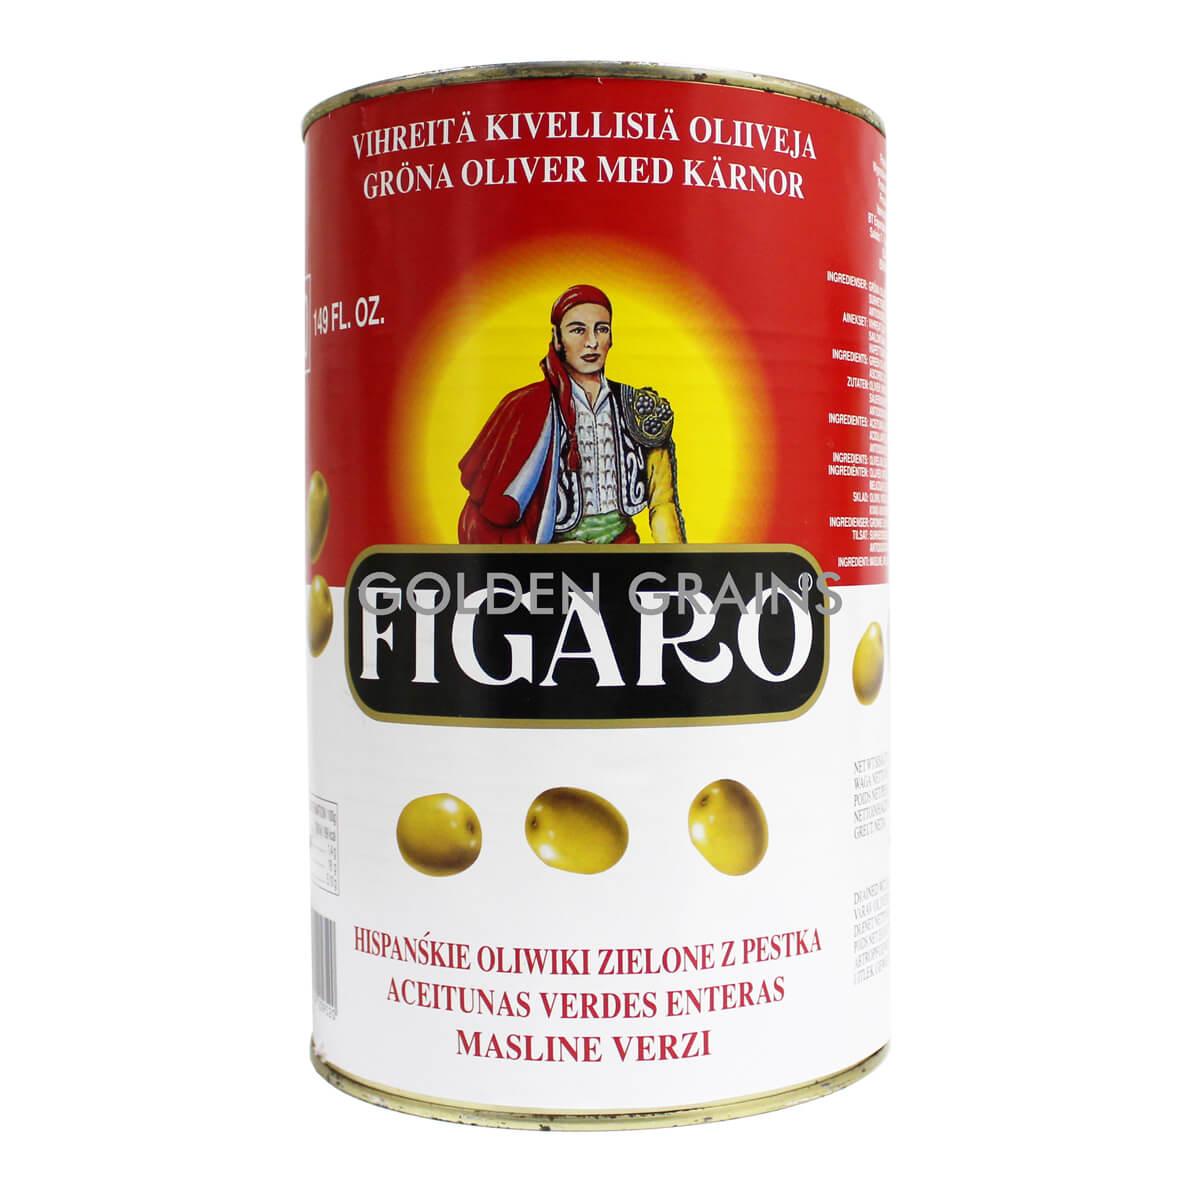 Golden Grains Figaro - Green Olives - Front.jpg